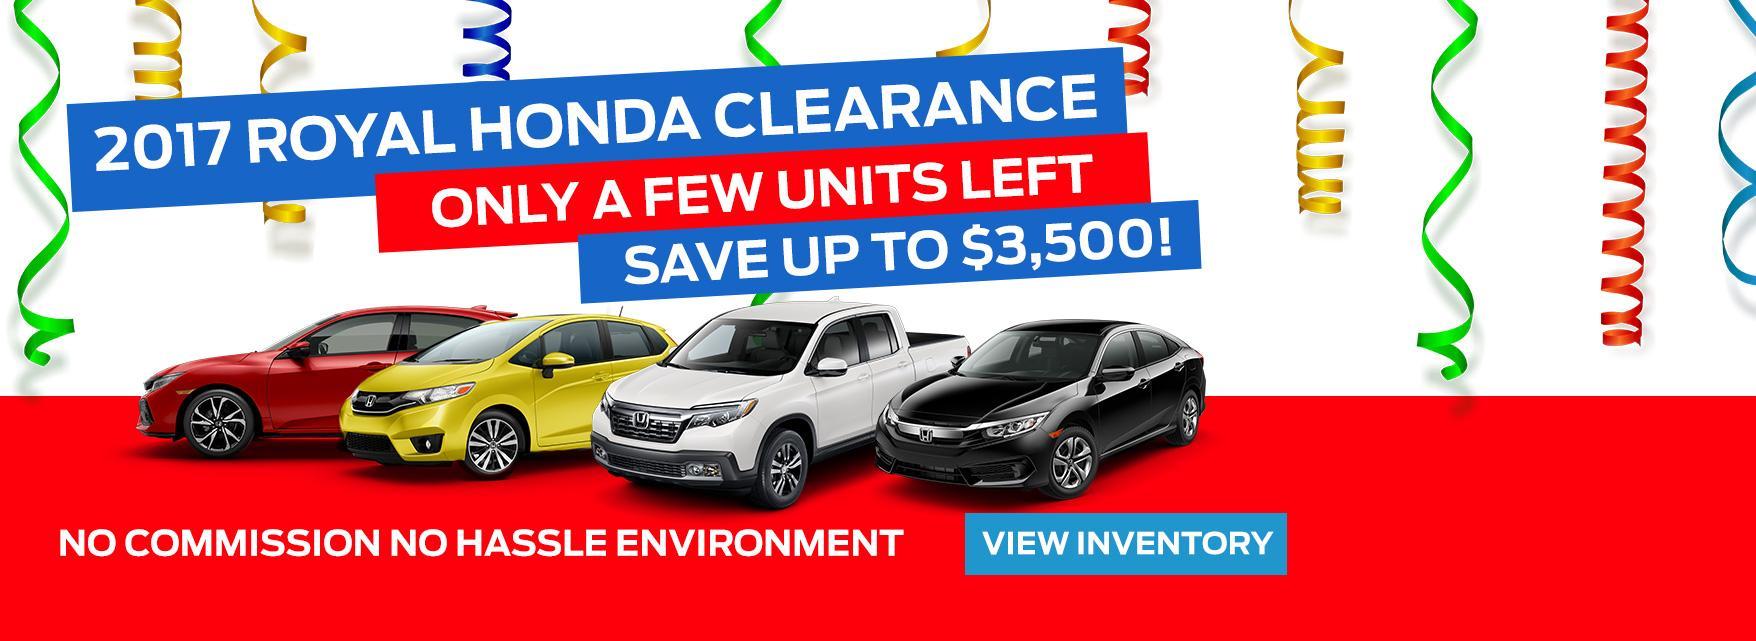 2017 Royal Honda Clearance